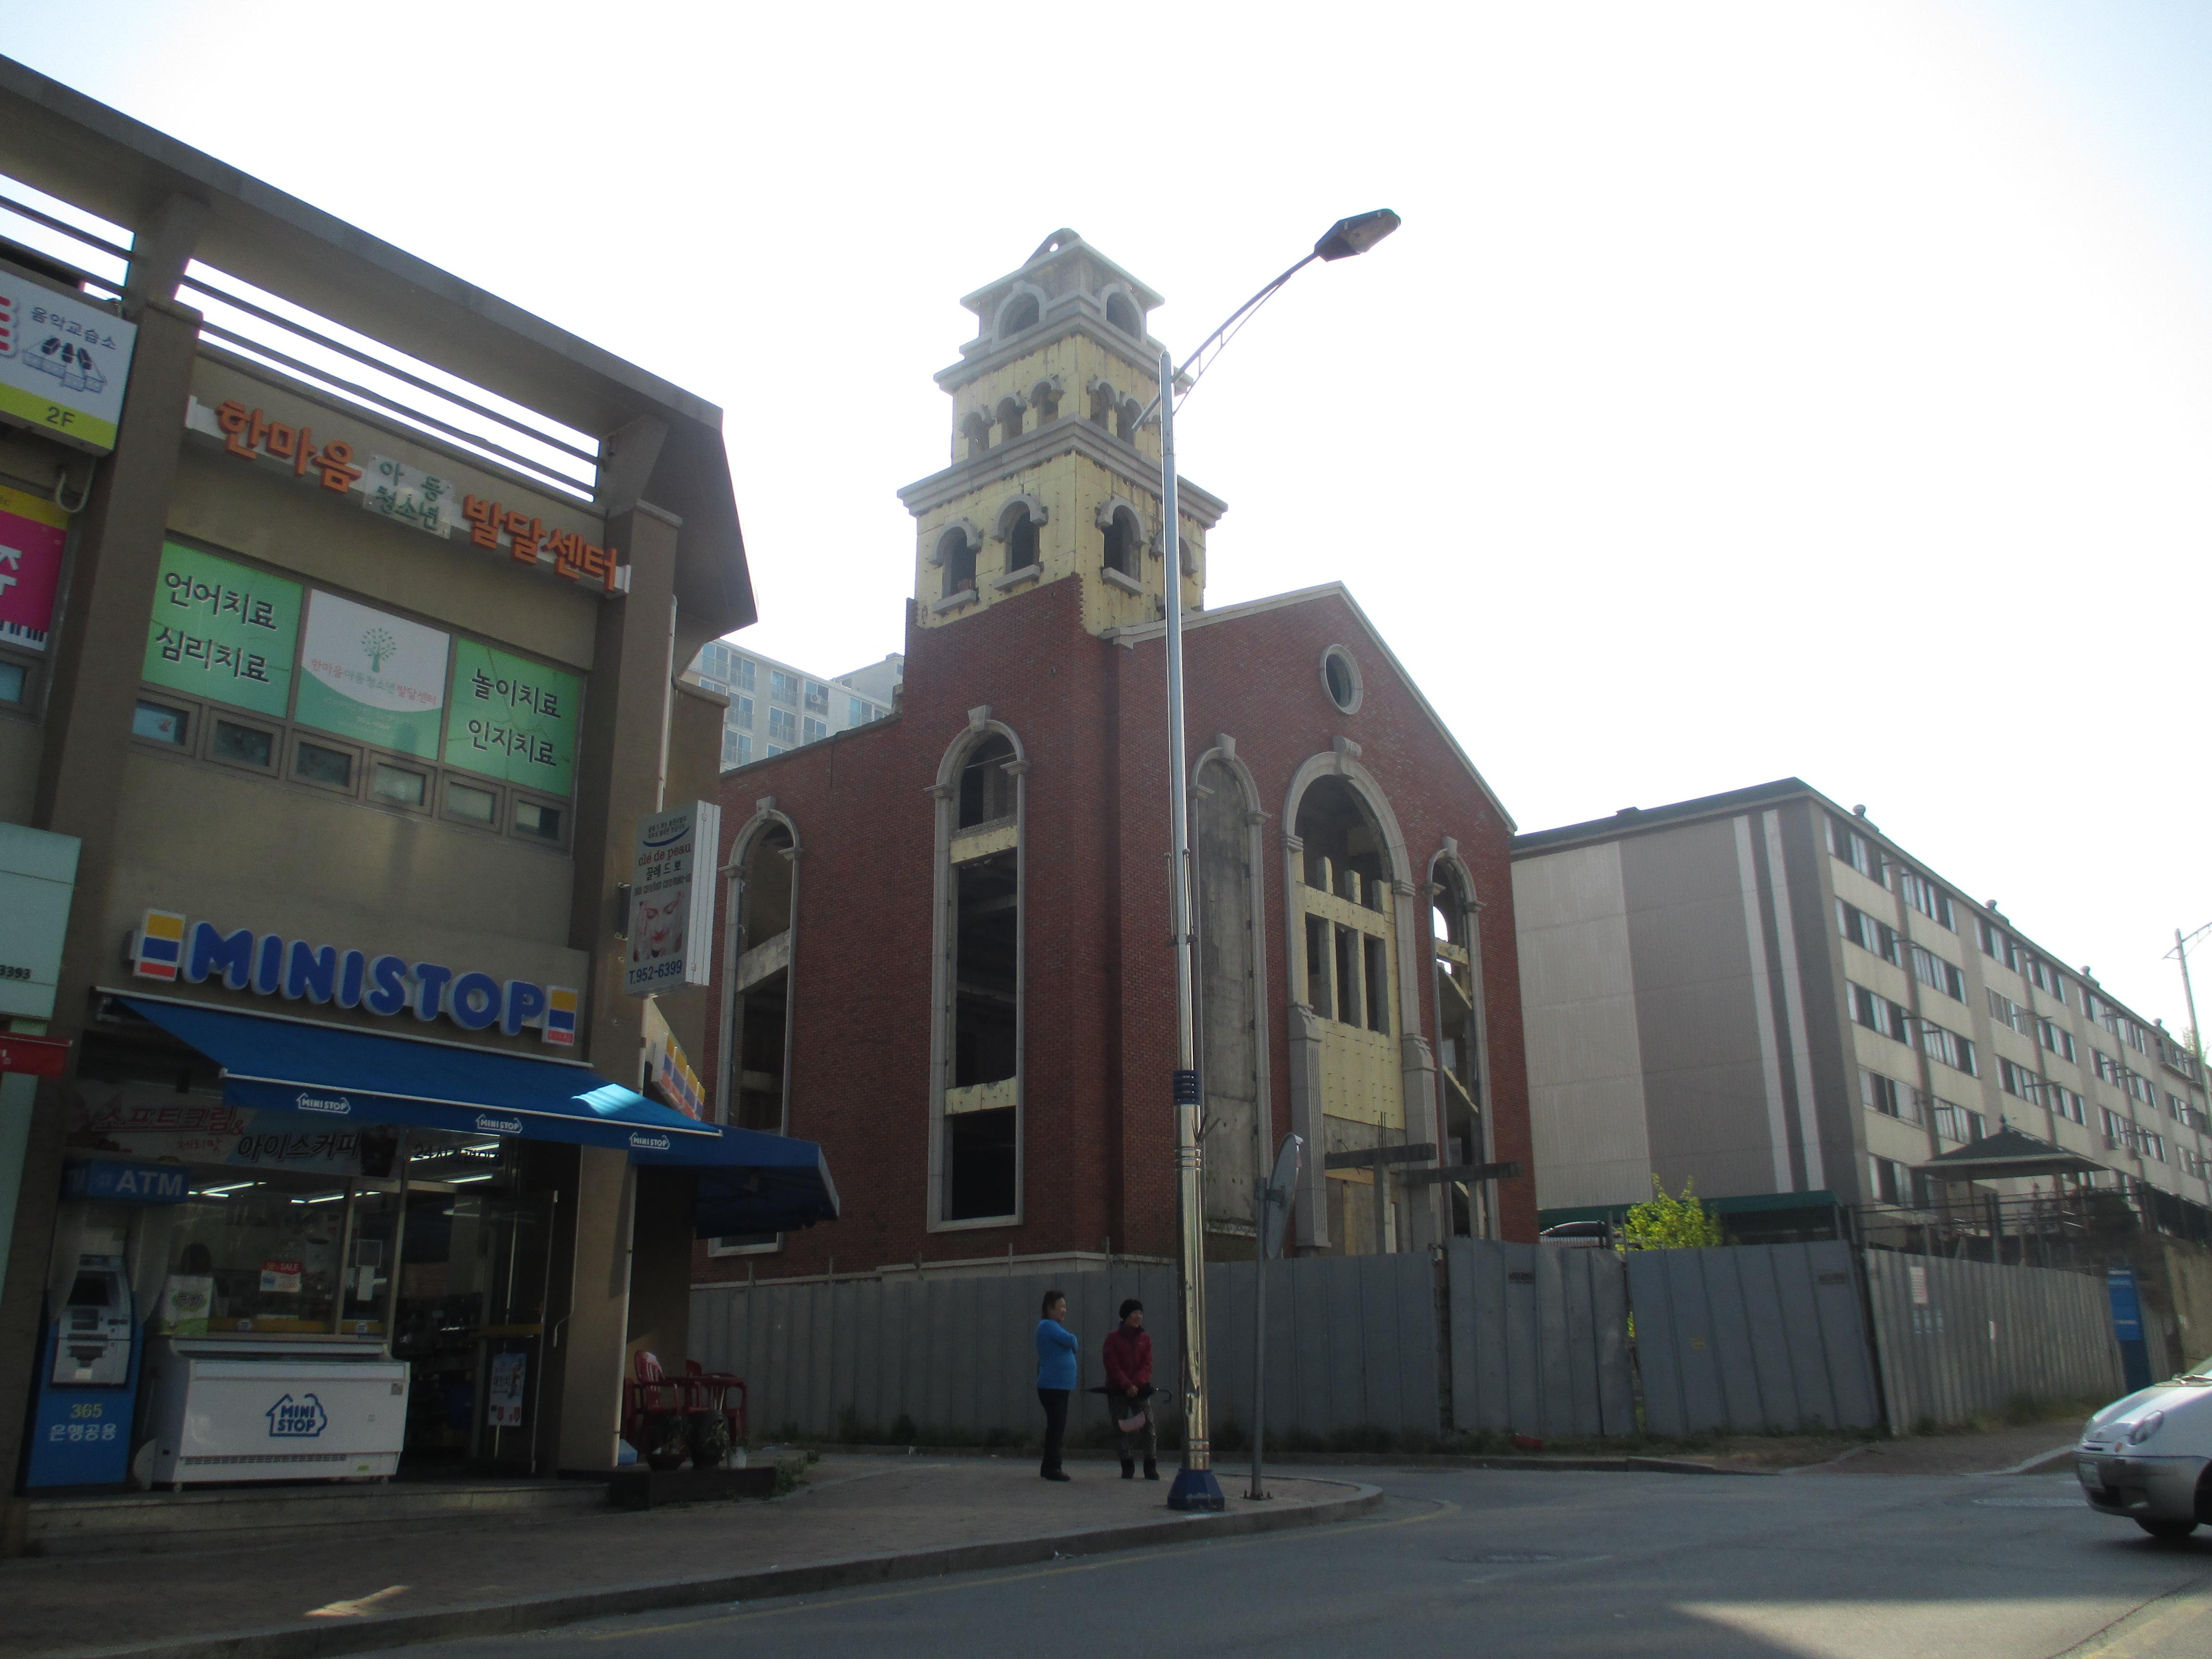 CHURCH INVOLVEMENT IN SOCIAL TRANSFORMNATION at EssayPedia.com